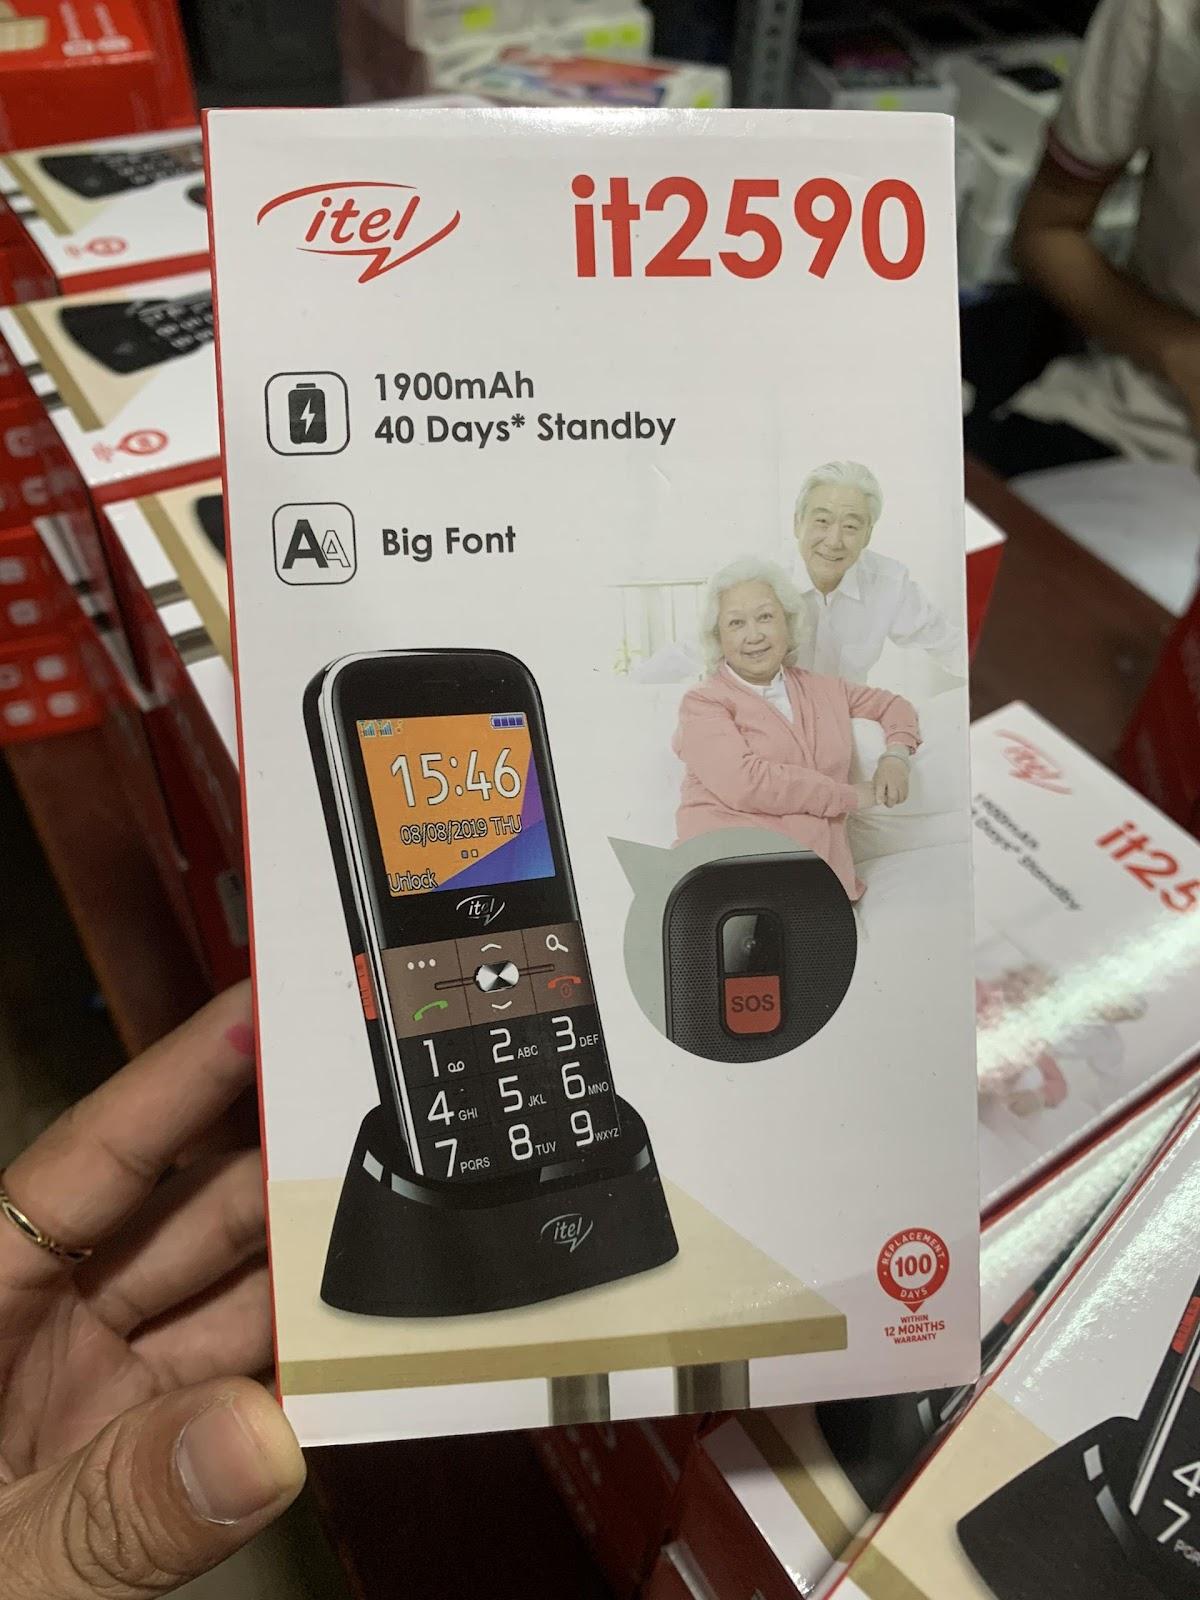 điện thoại itel it2590, điện thoại itel it2590 giá sỉ, điện thoại itel  it2590 giá rẻ, chuyên phân phối điện thoại itel it2590